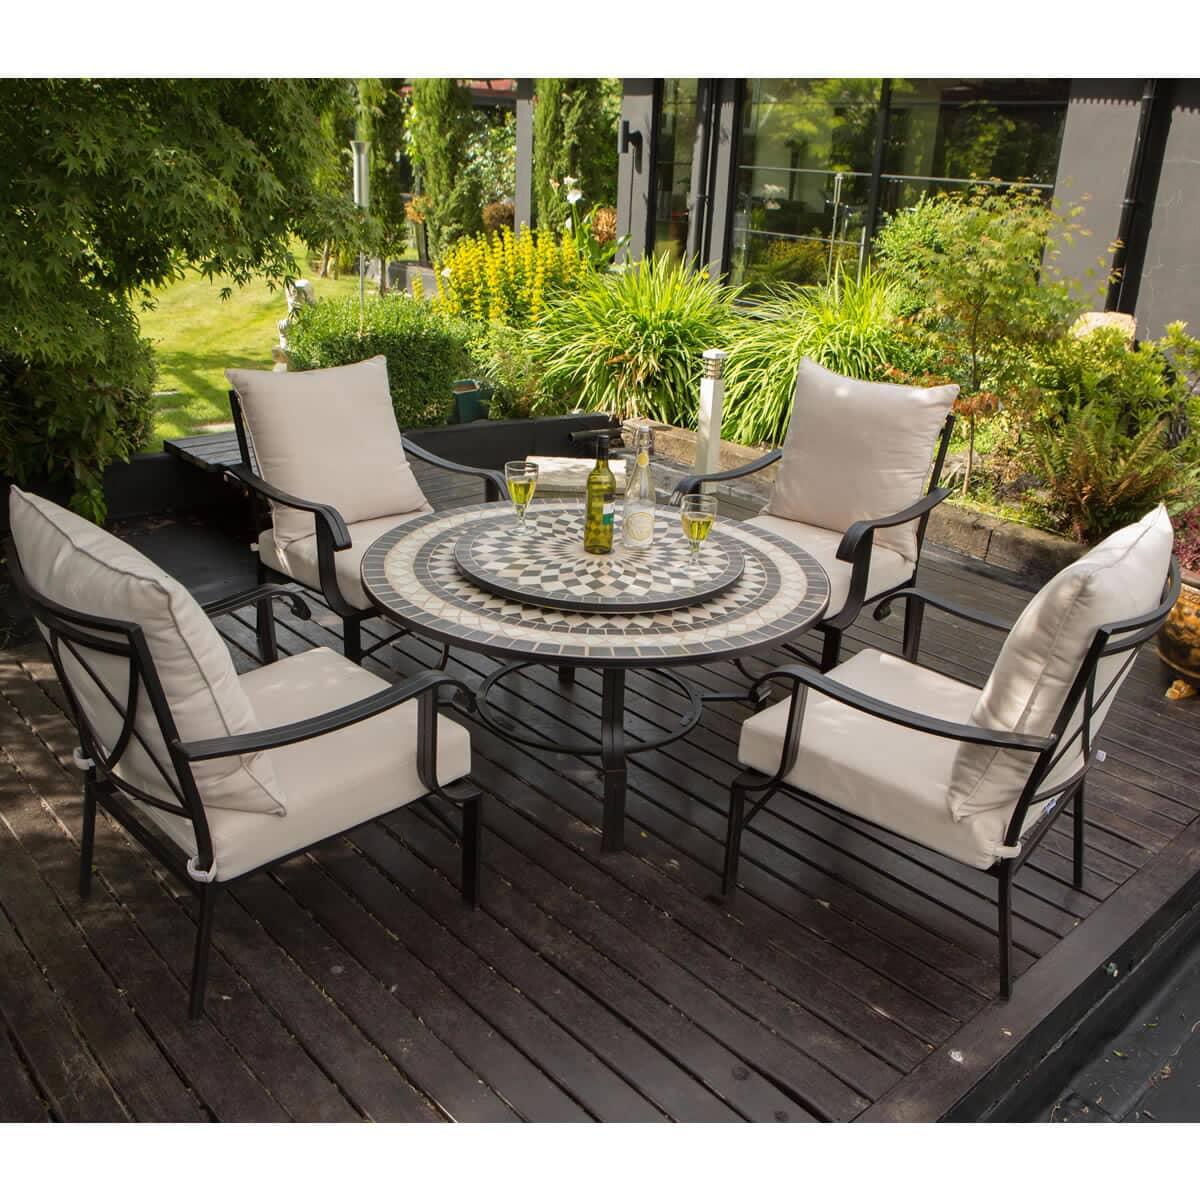 Lg Outdoor Casablanca 4 Seat Charcoal Firepit Lounge Set